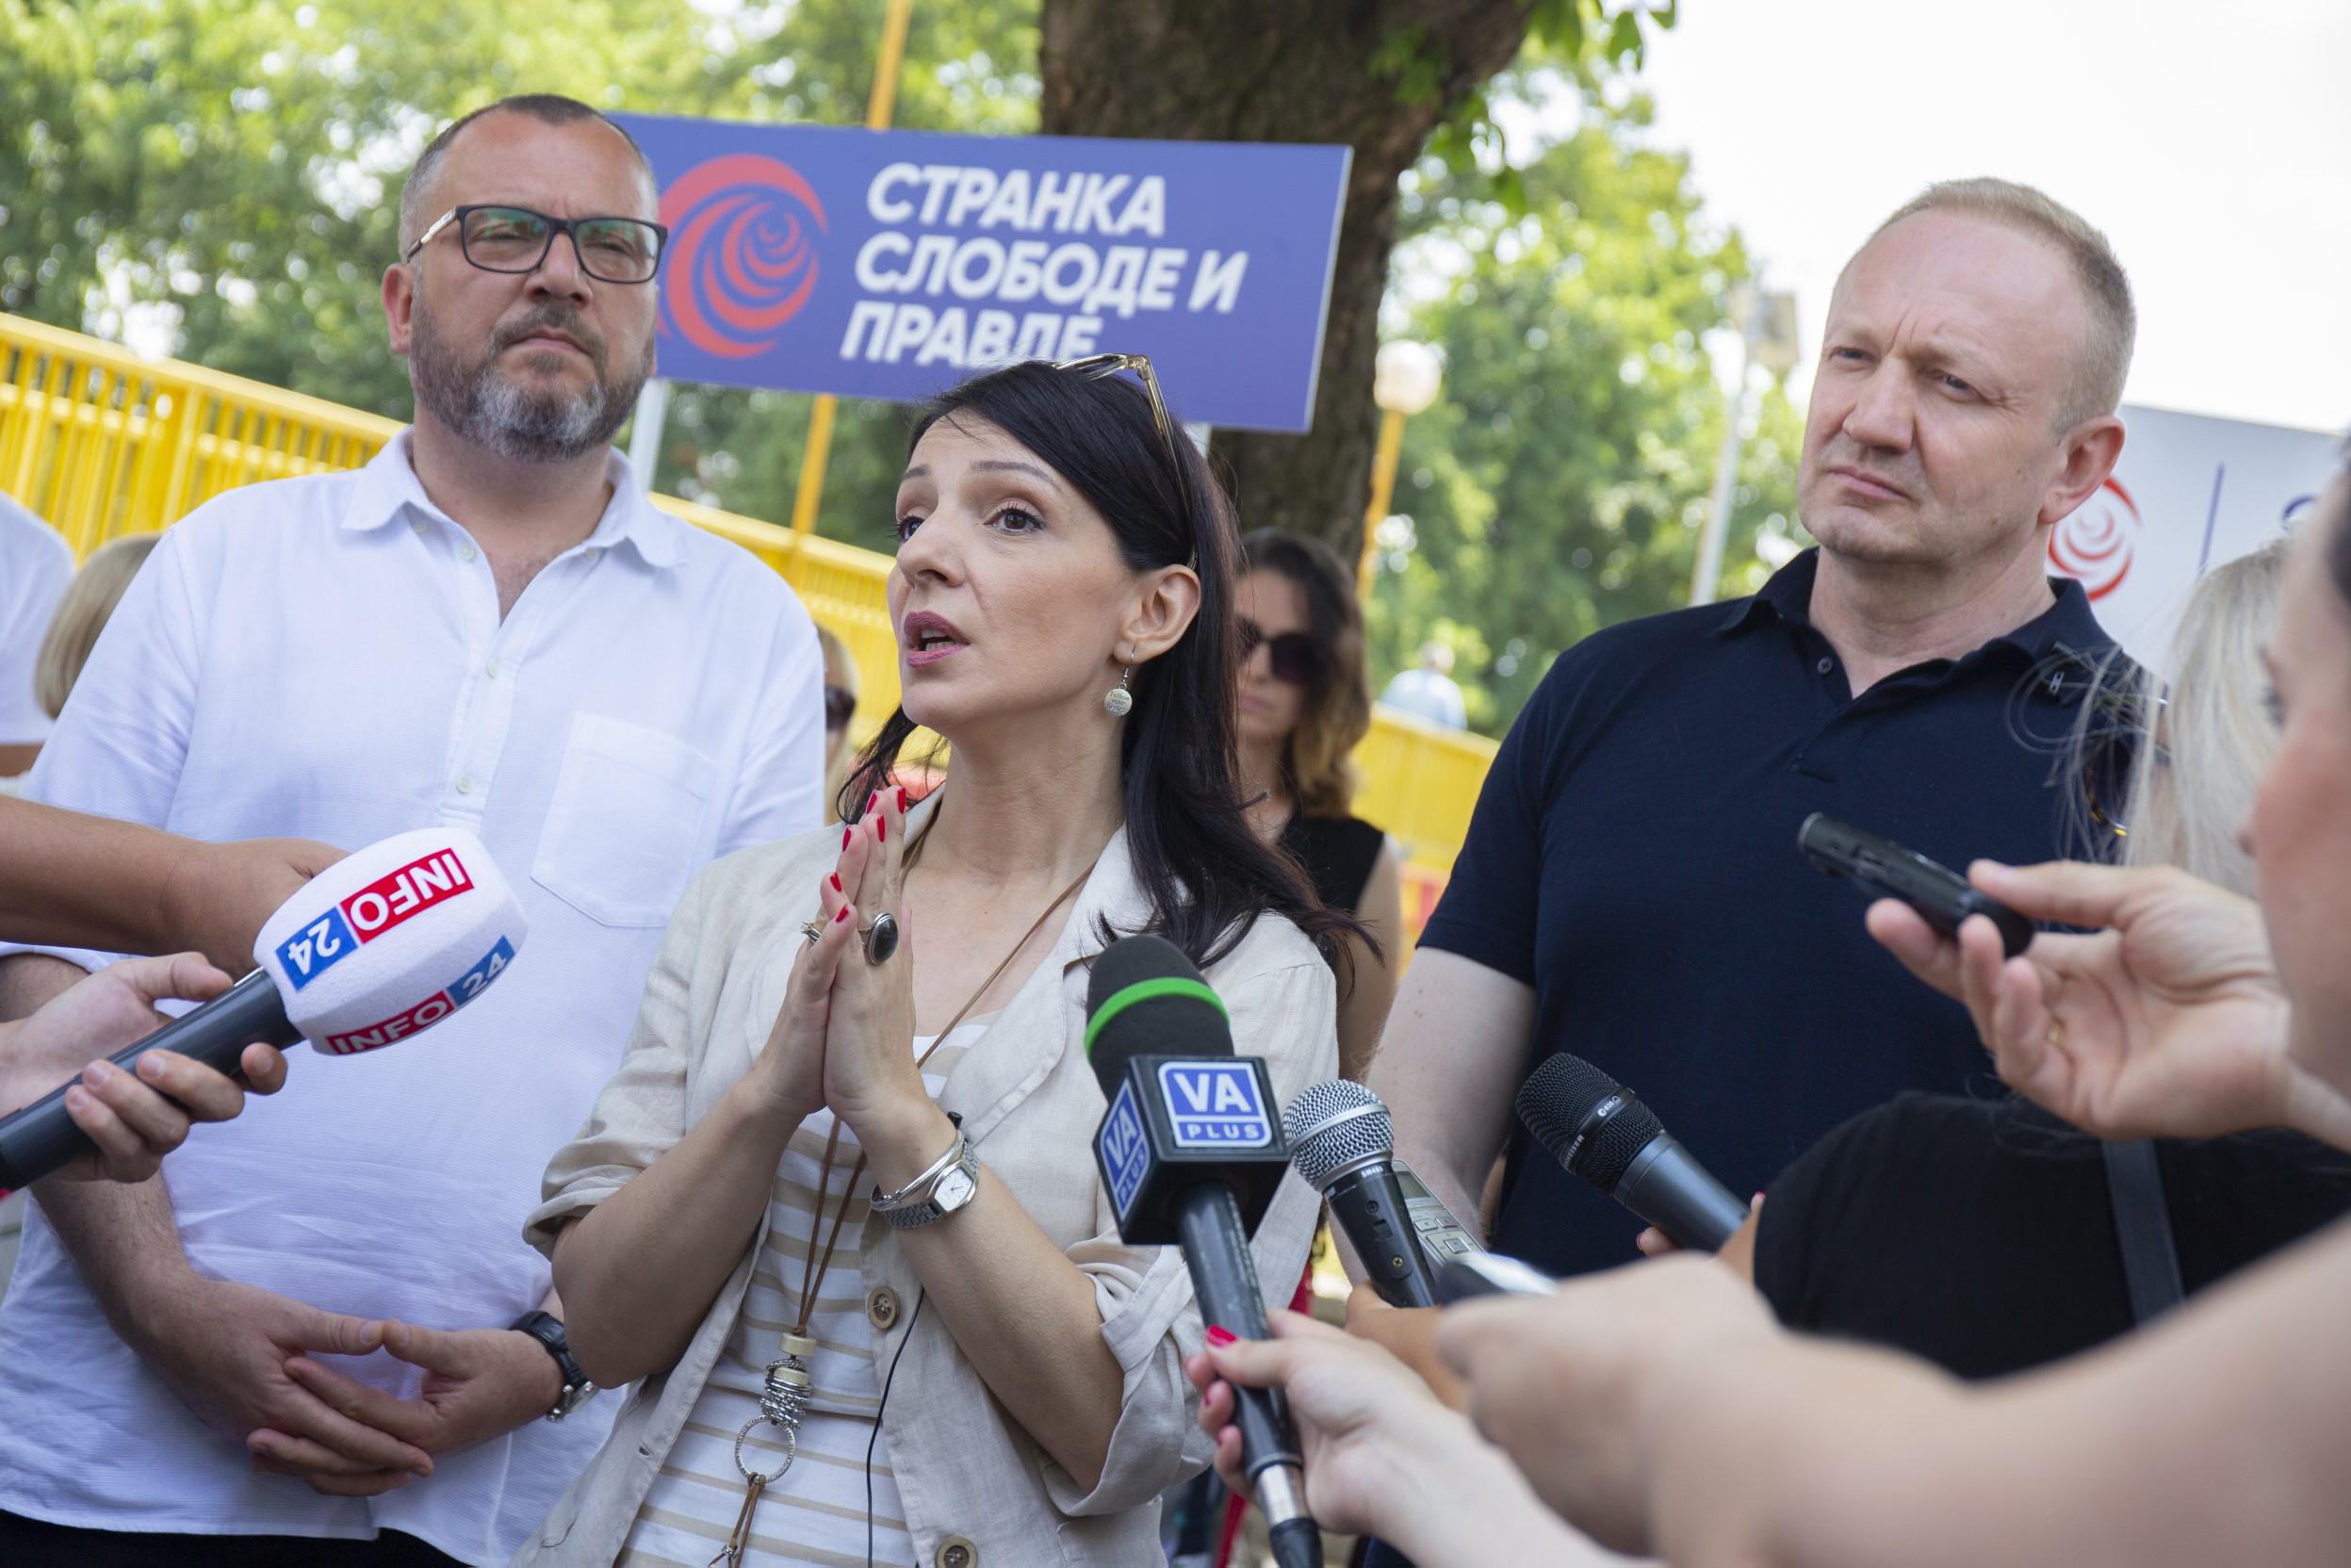 Marinika Tepić i Dragan Đilas, Dragan Djilas, Stranka slobode i pravde, SSP